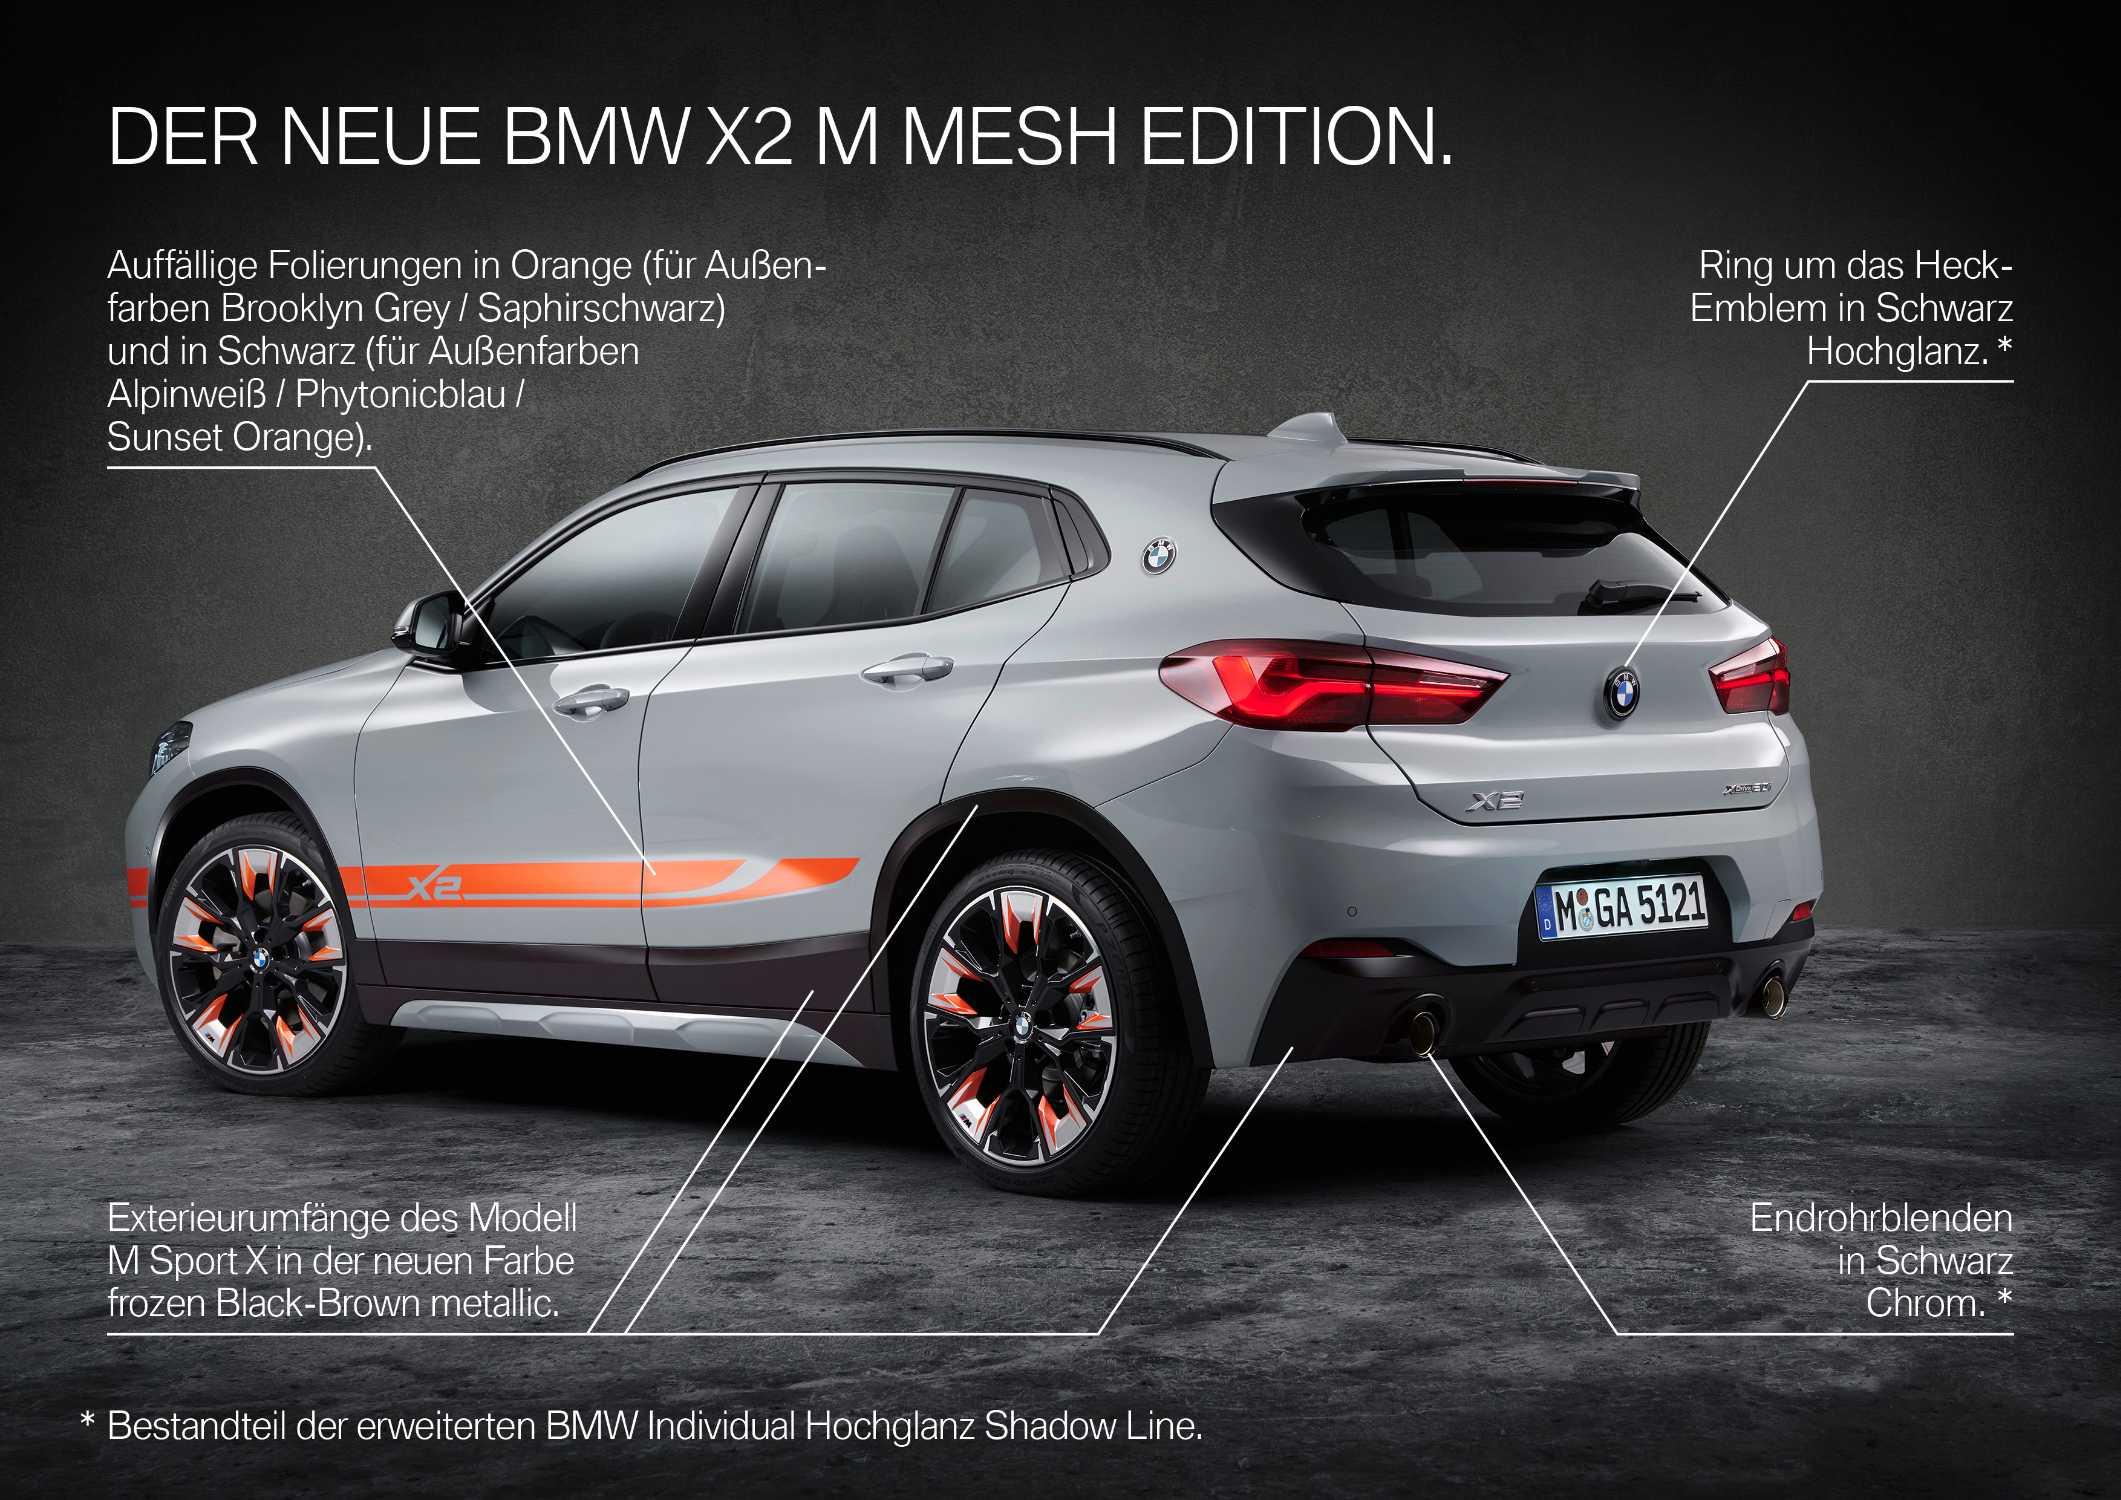 The new BMW X2 xDrive20i M Mesh Edition (09/2020).